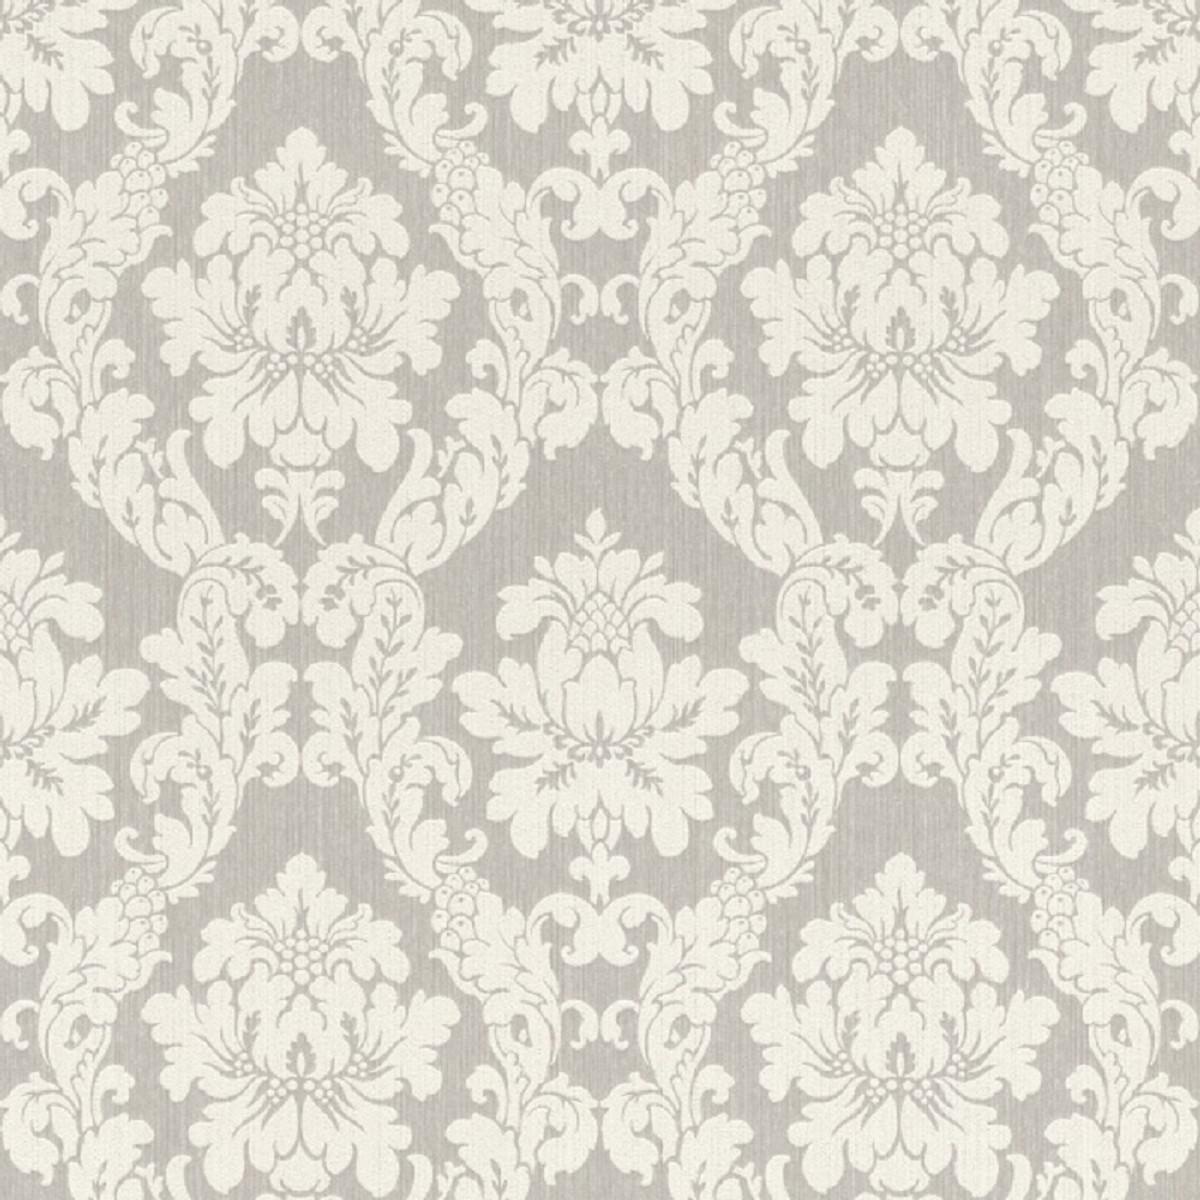 Casa Padrino Barock Textiltapete Weiß / Beige / Creme / Grau / Silber - 10,05 x 0,53 m - Stofftapete im Barockstil 1